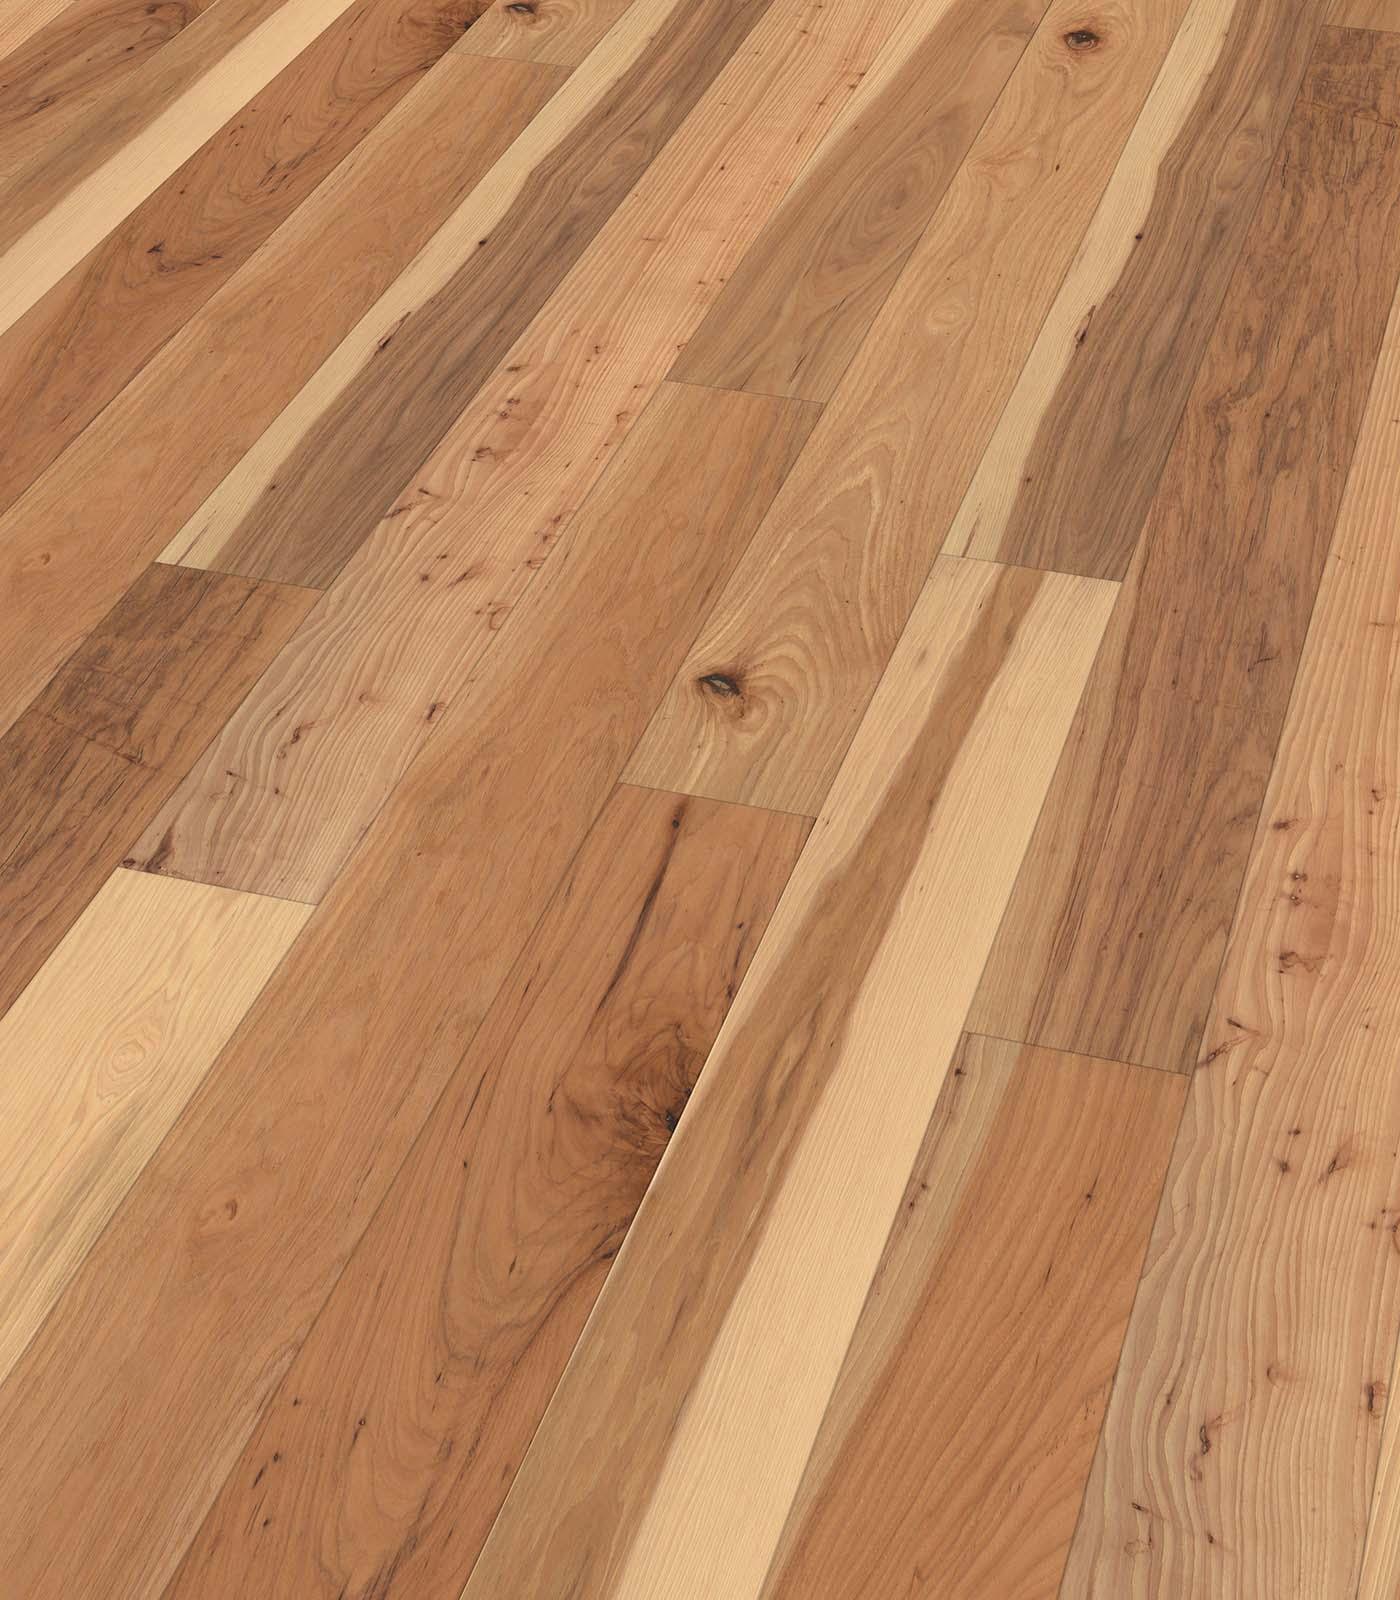 Pecan-engineered floors-Origins Collection-angle